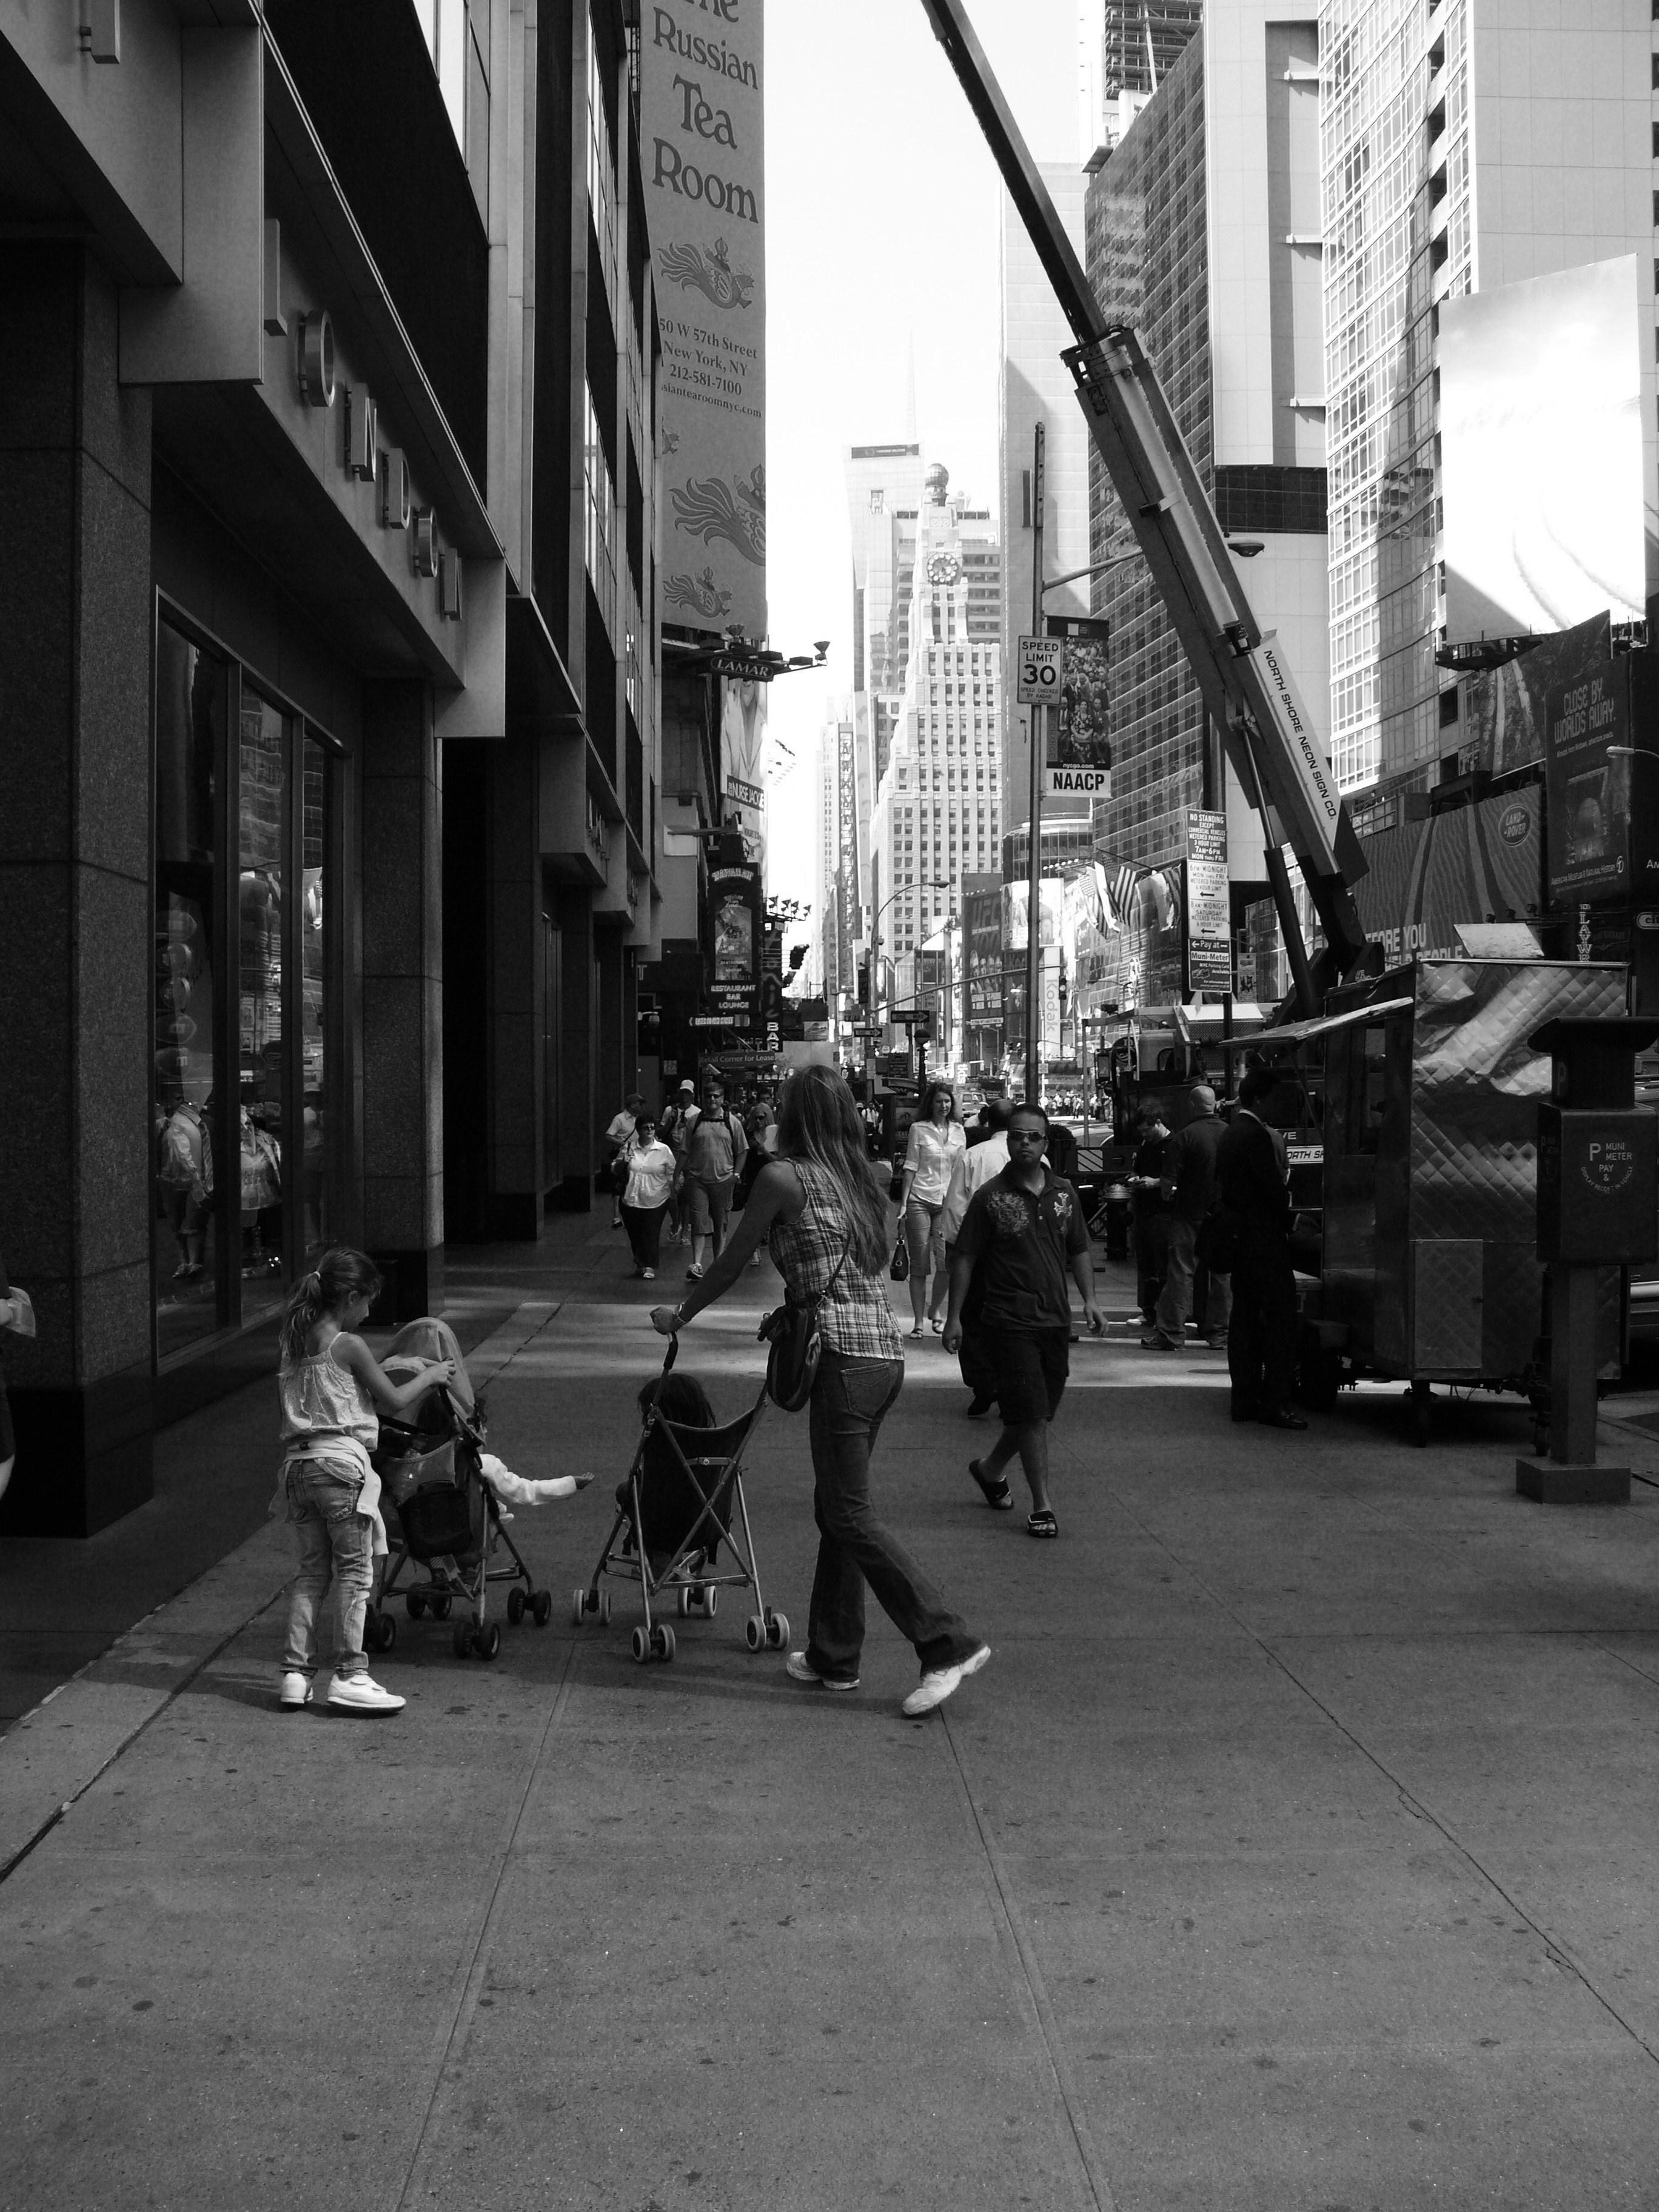 New York City with a Leica V-Lux1 | mydistriKt